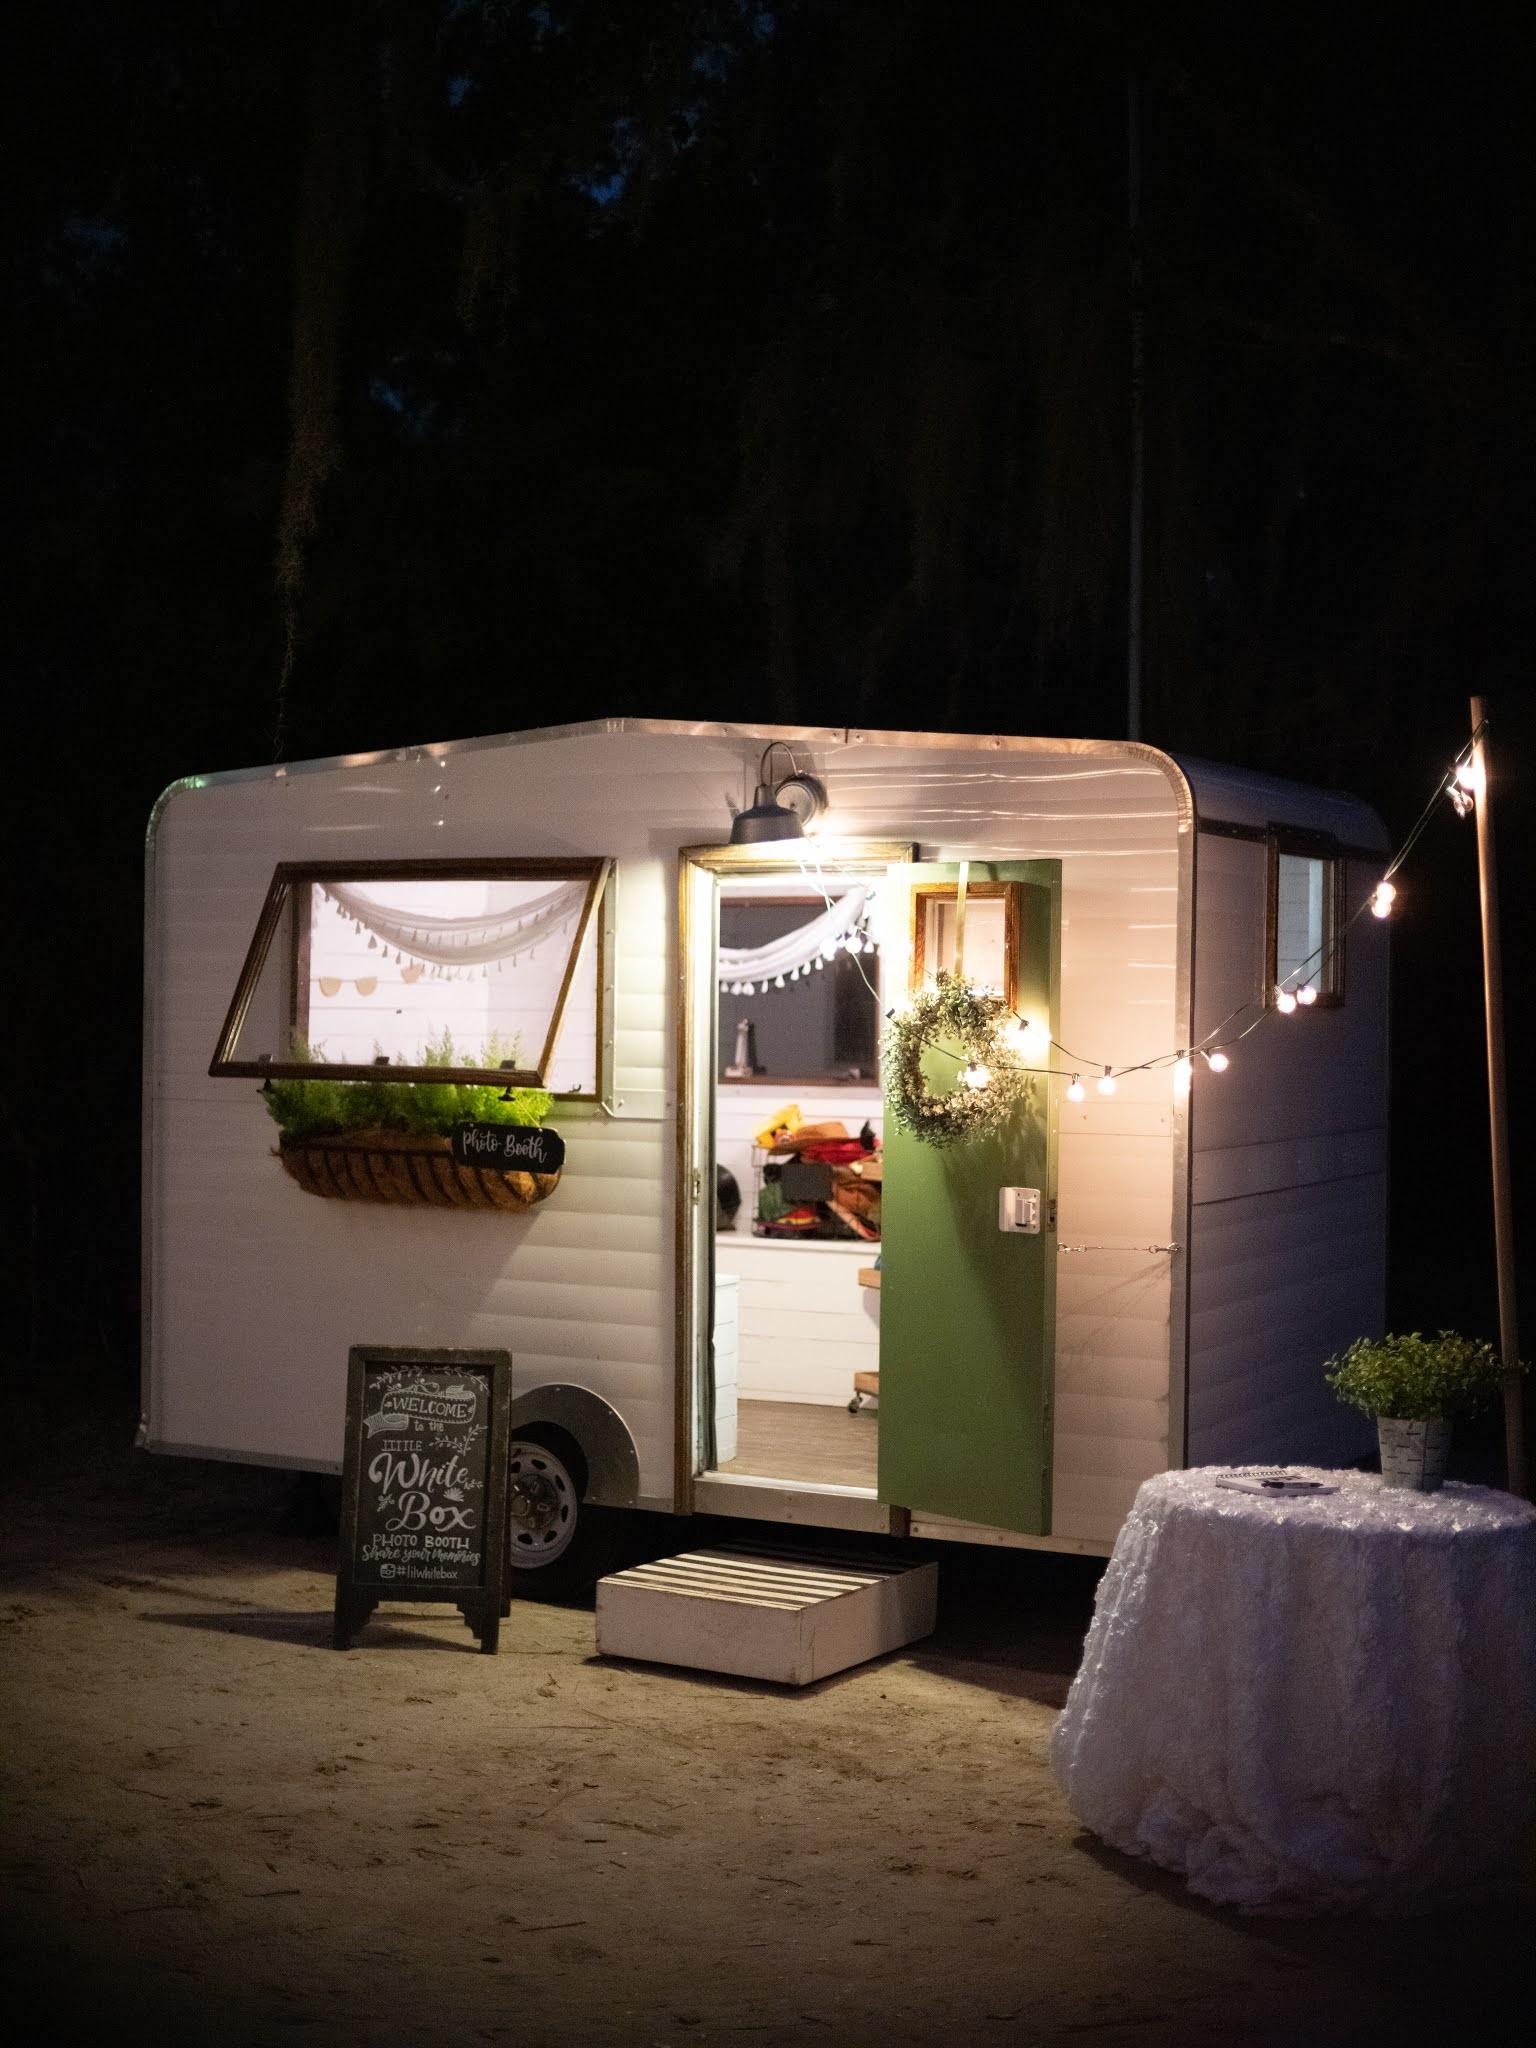 Charleston Photobooth Weddings - Chasing Cinderella